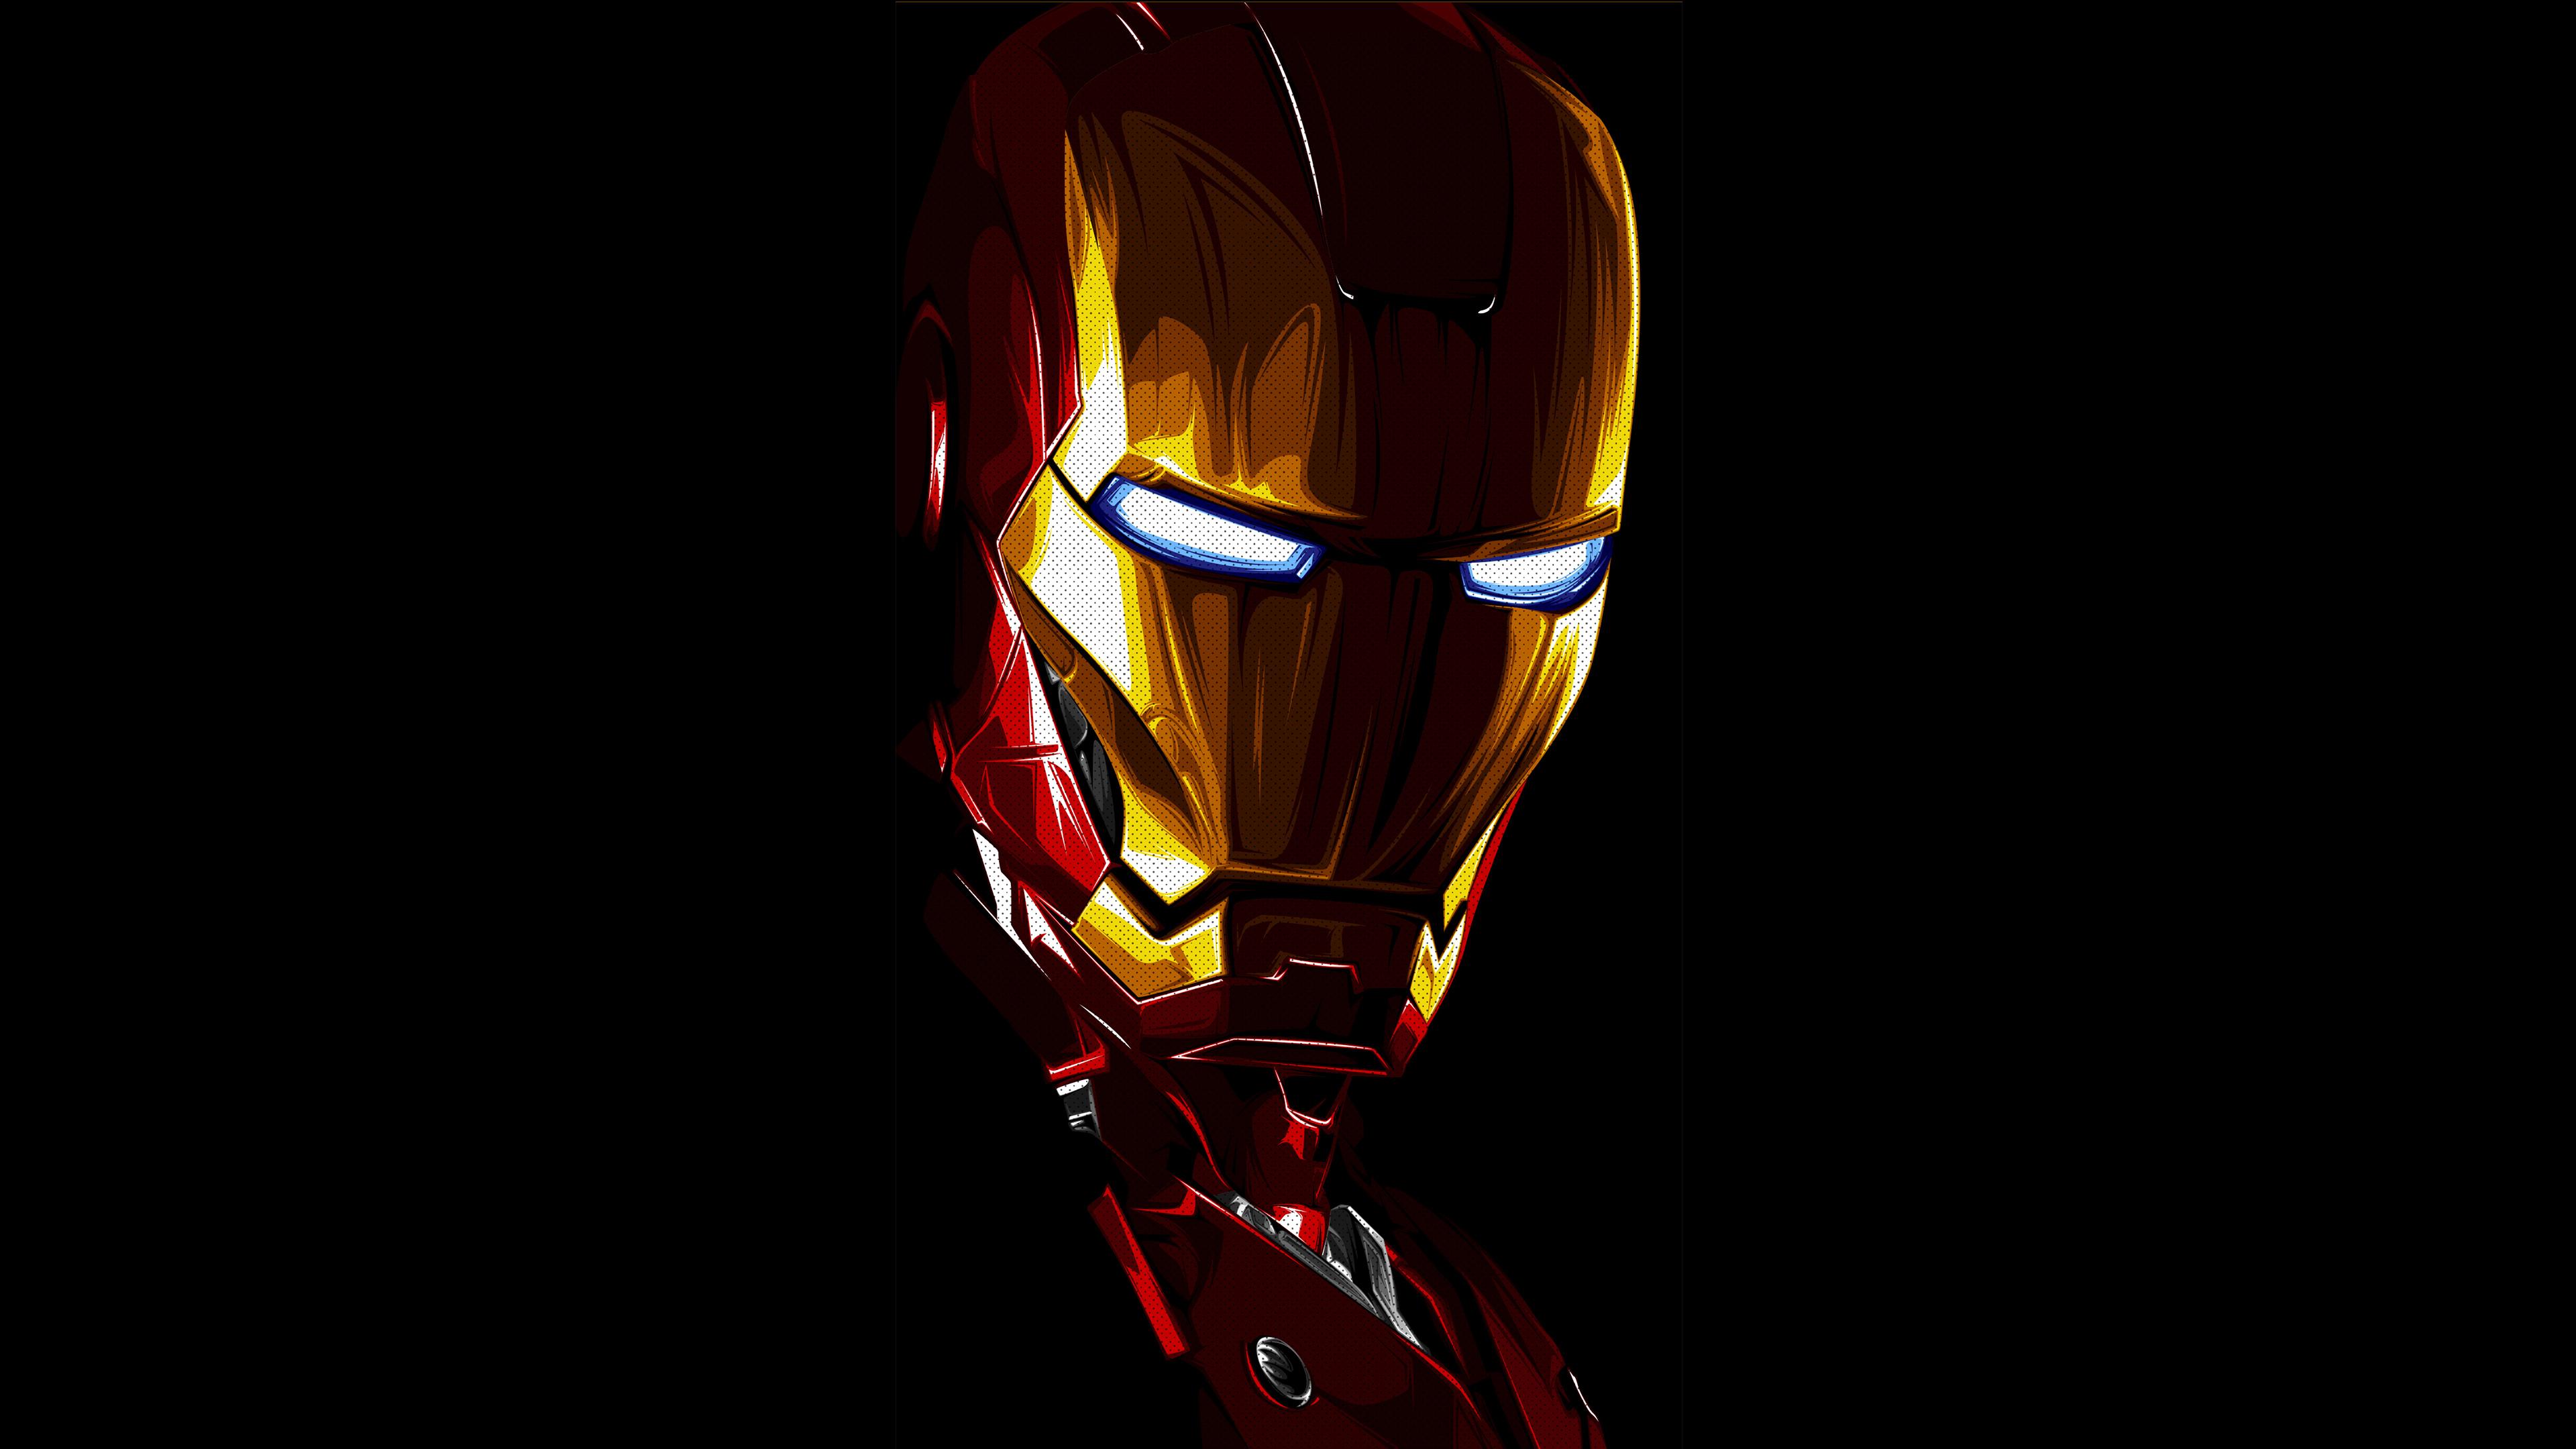 iron man 4k new artworks 1565052744 - Iron Man 4k New Artworks - superheroes wallpapers, iron man wallpapers, hd-wallpapers, digital art wallpapers, behance wallpapers, artwork wallpapers, 4k-wallpapers